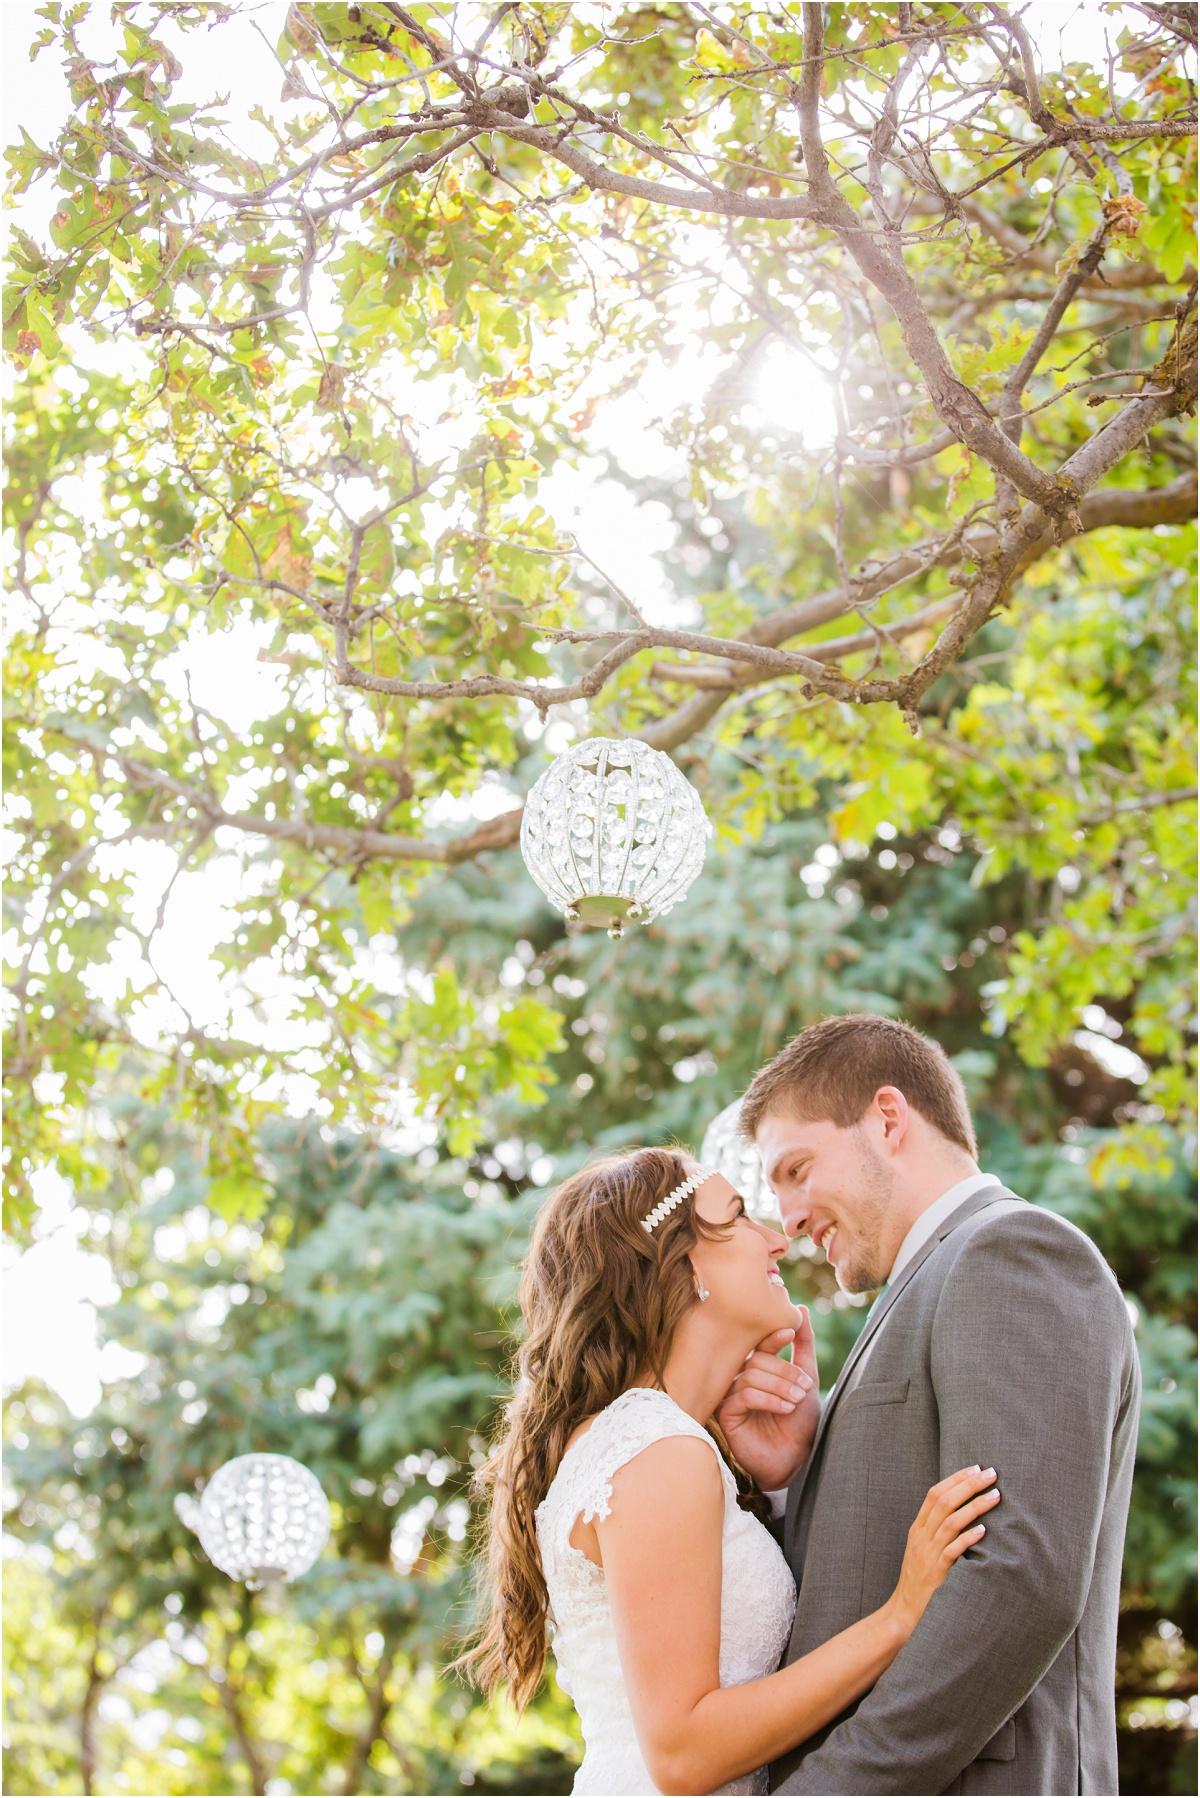 Davis County Private Venue Wedding Terra Cooper Photography_3473.jpg